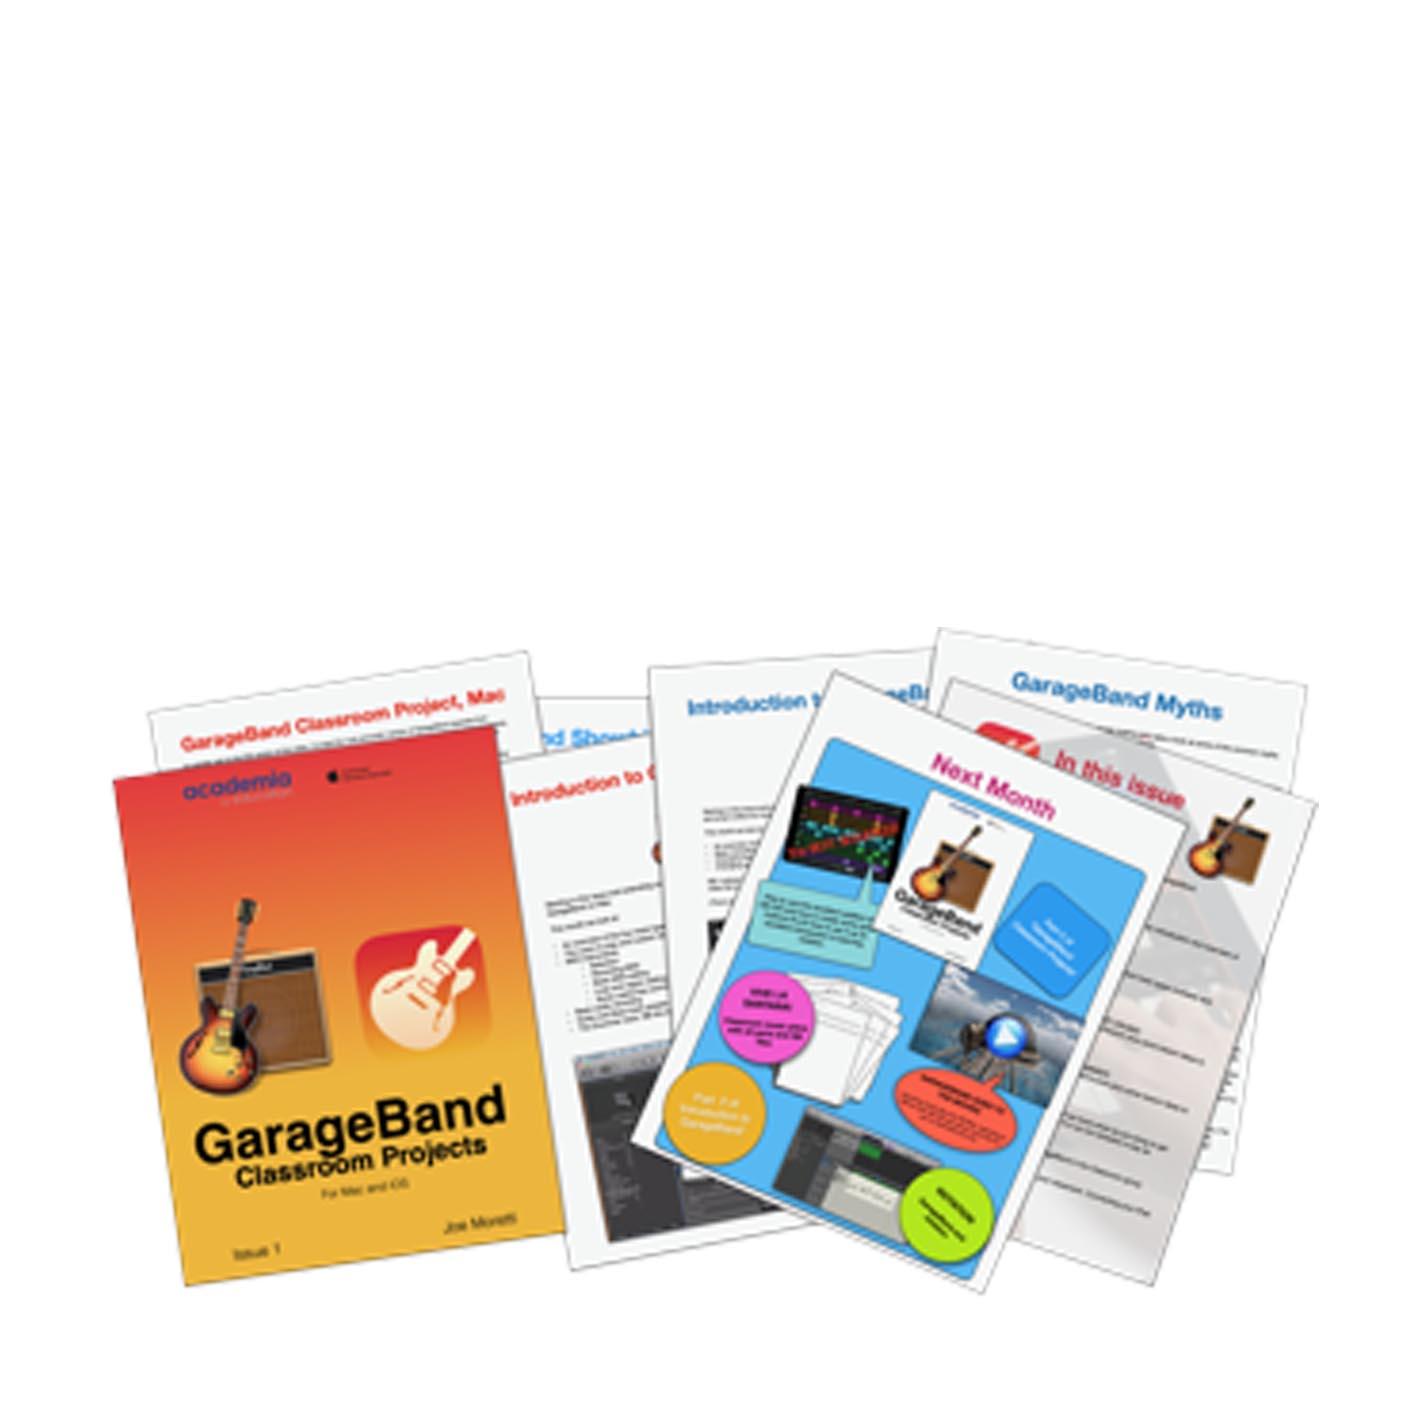 GarageBand Classroom Projects